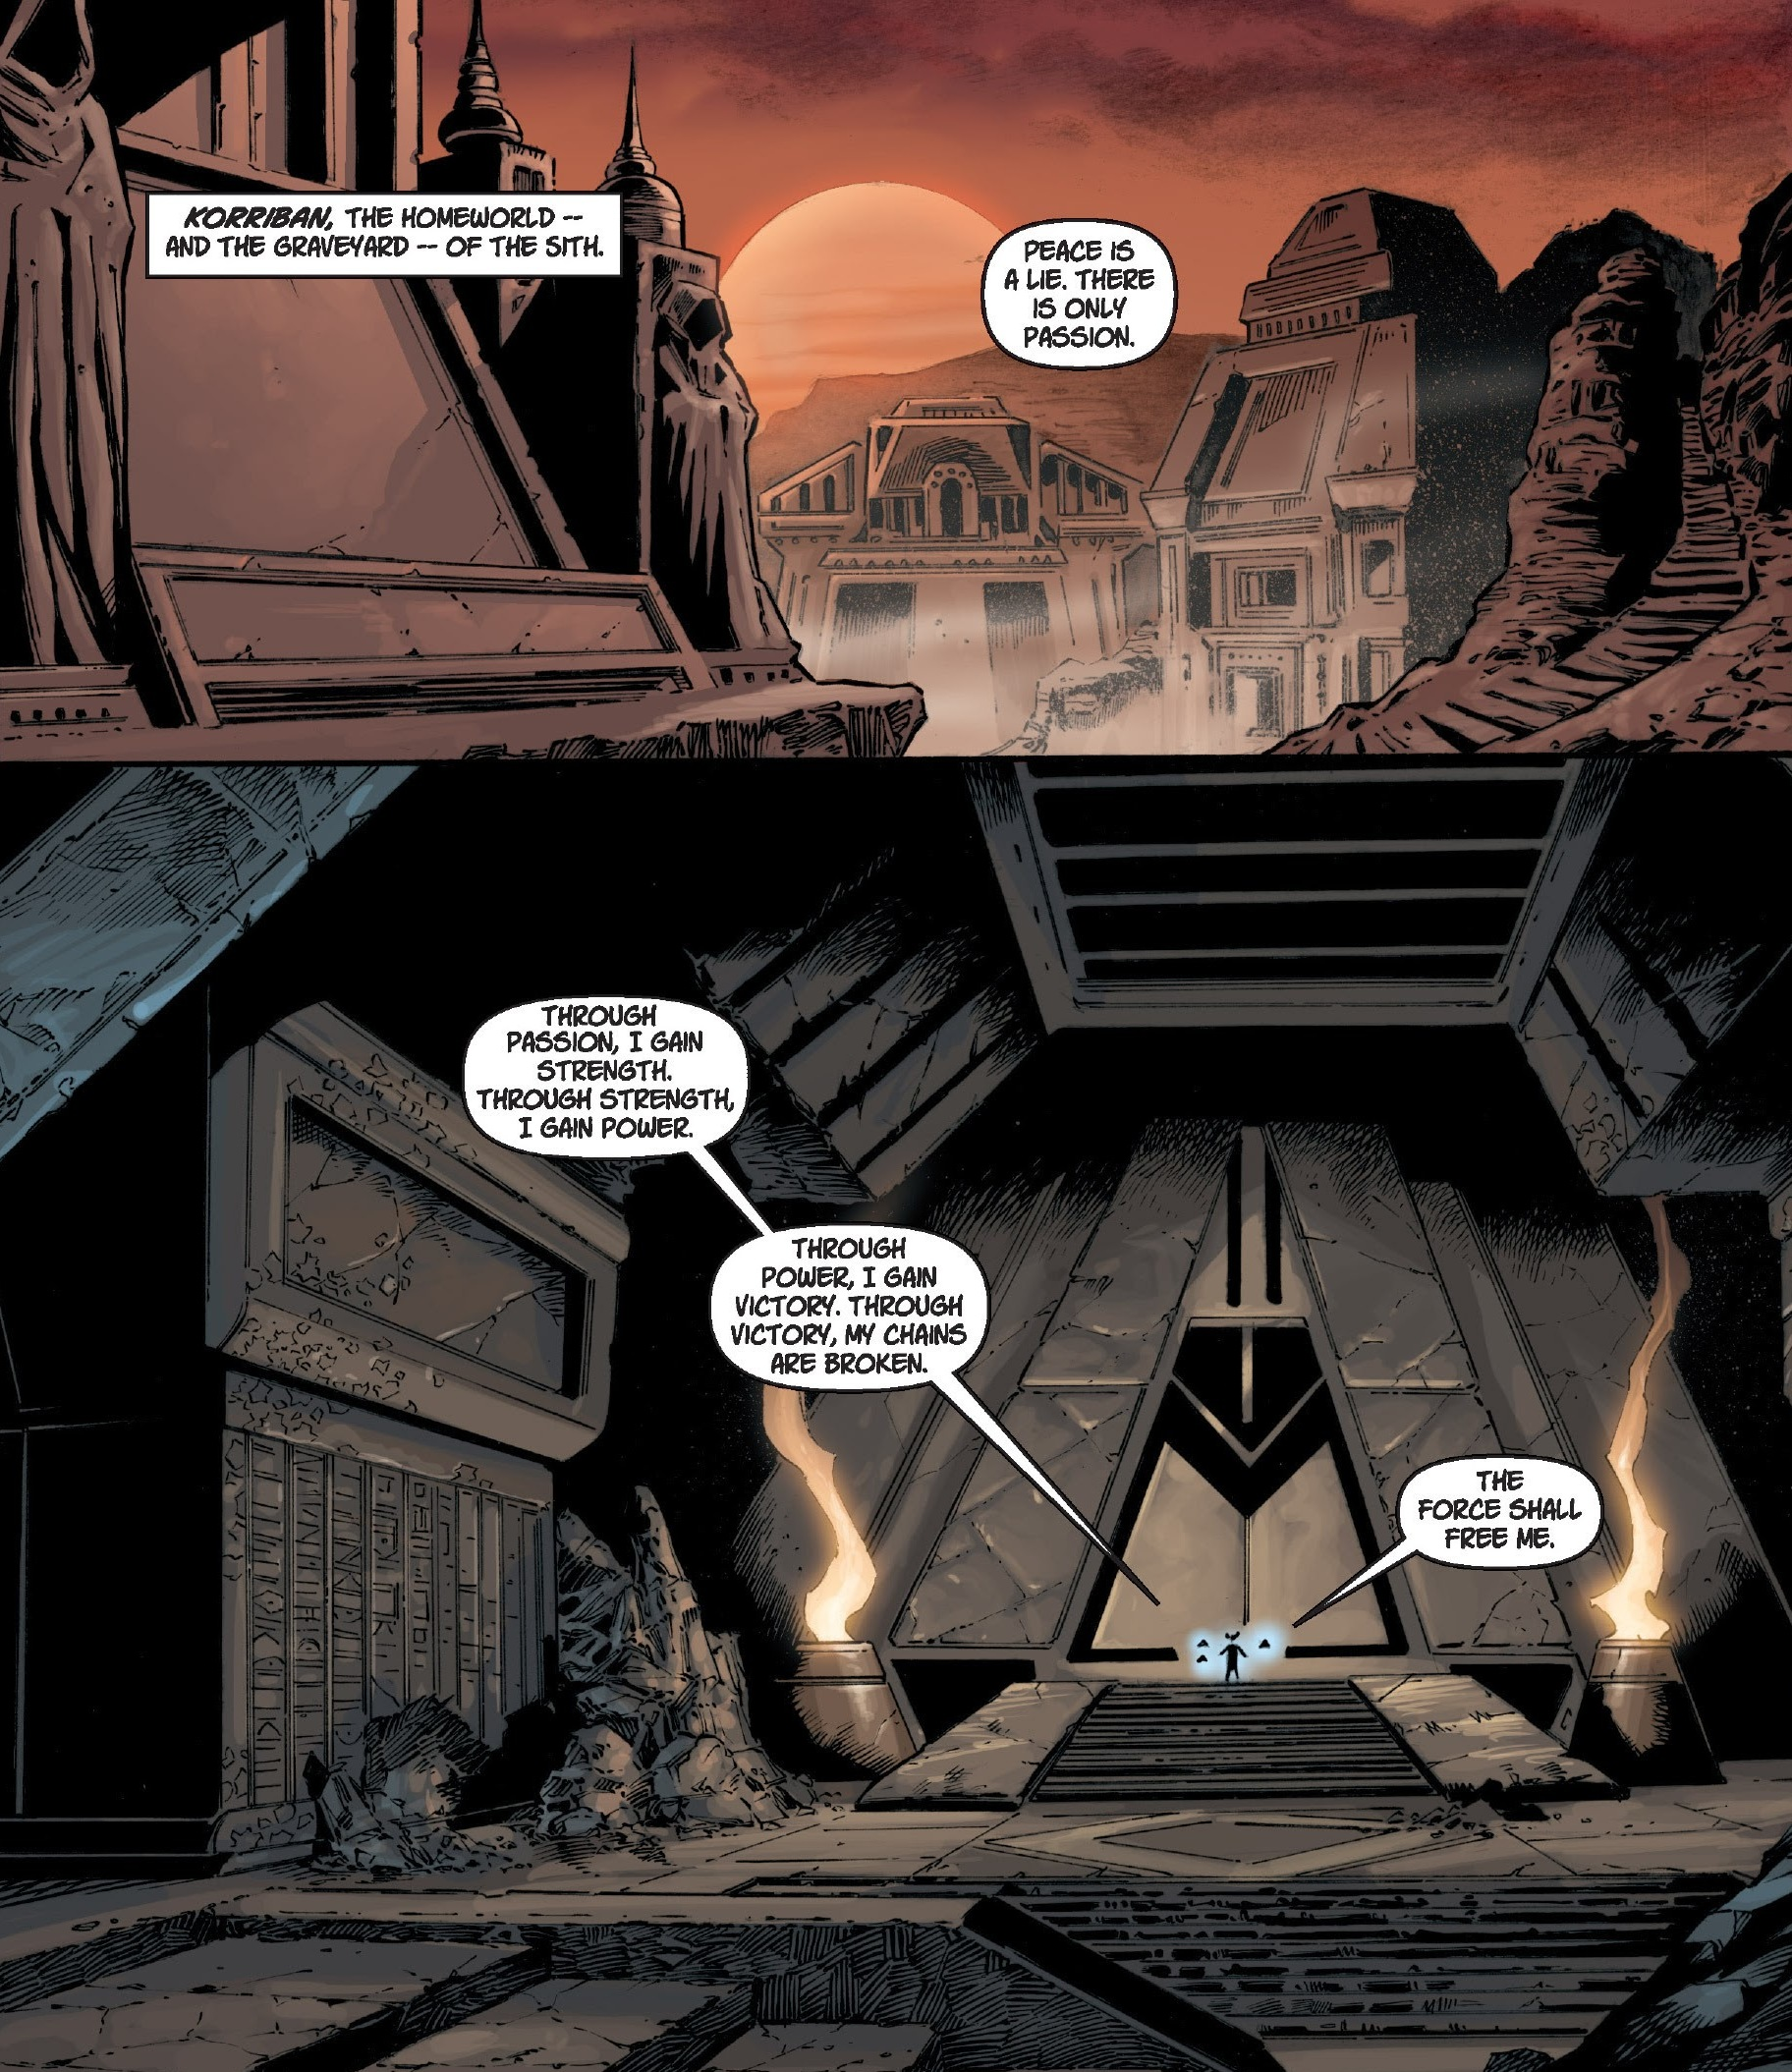 The Sith City